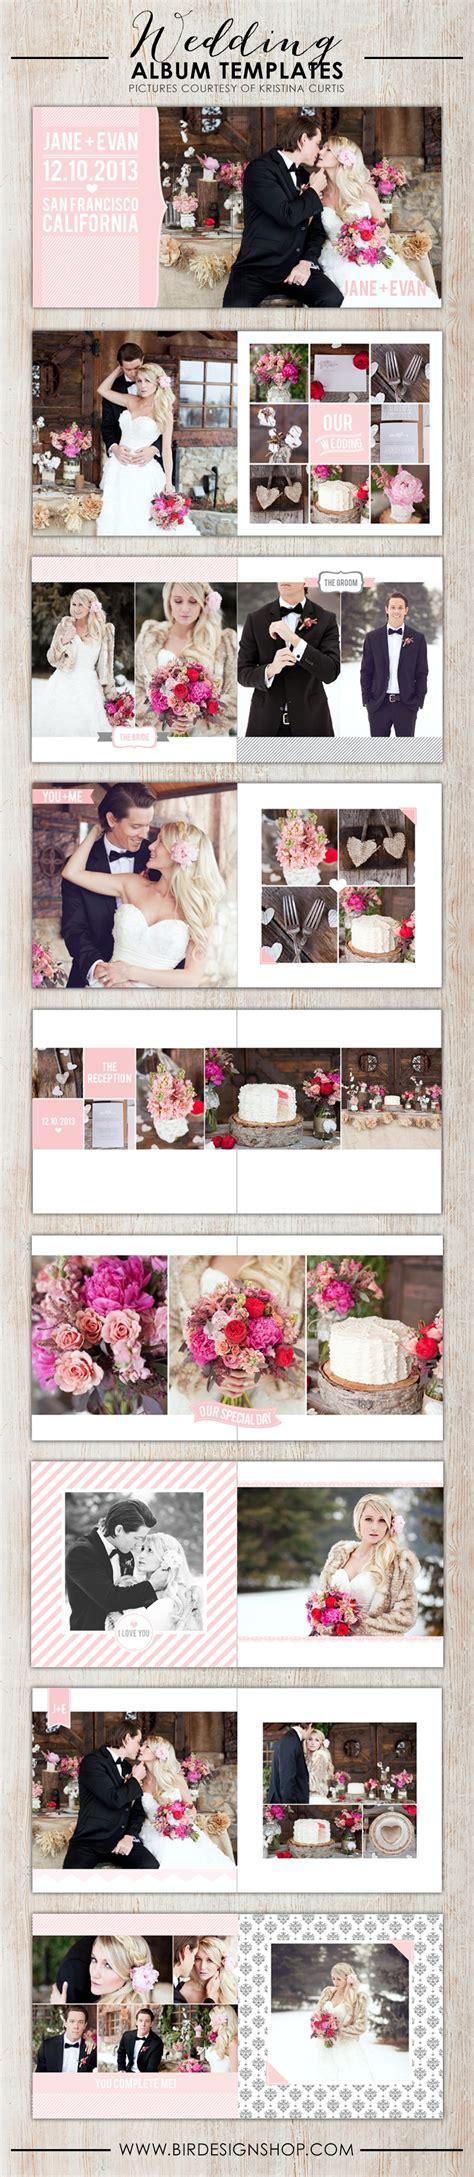 photoshop templates for wedding albums new wedding albums birdesign